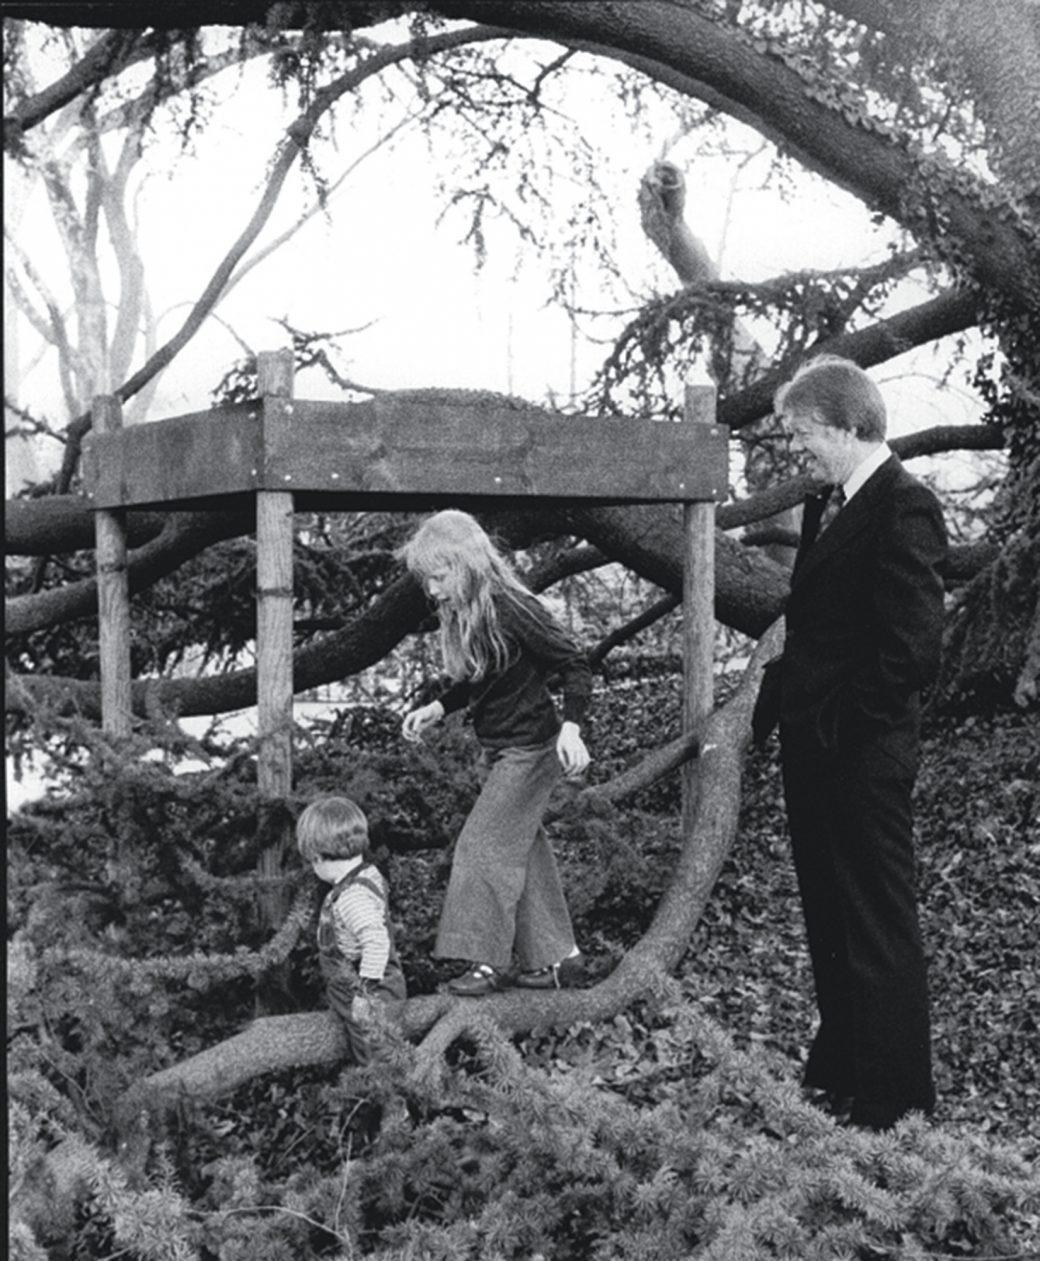 Jimmy Carter Tree house